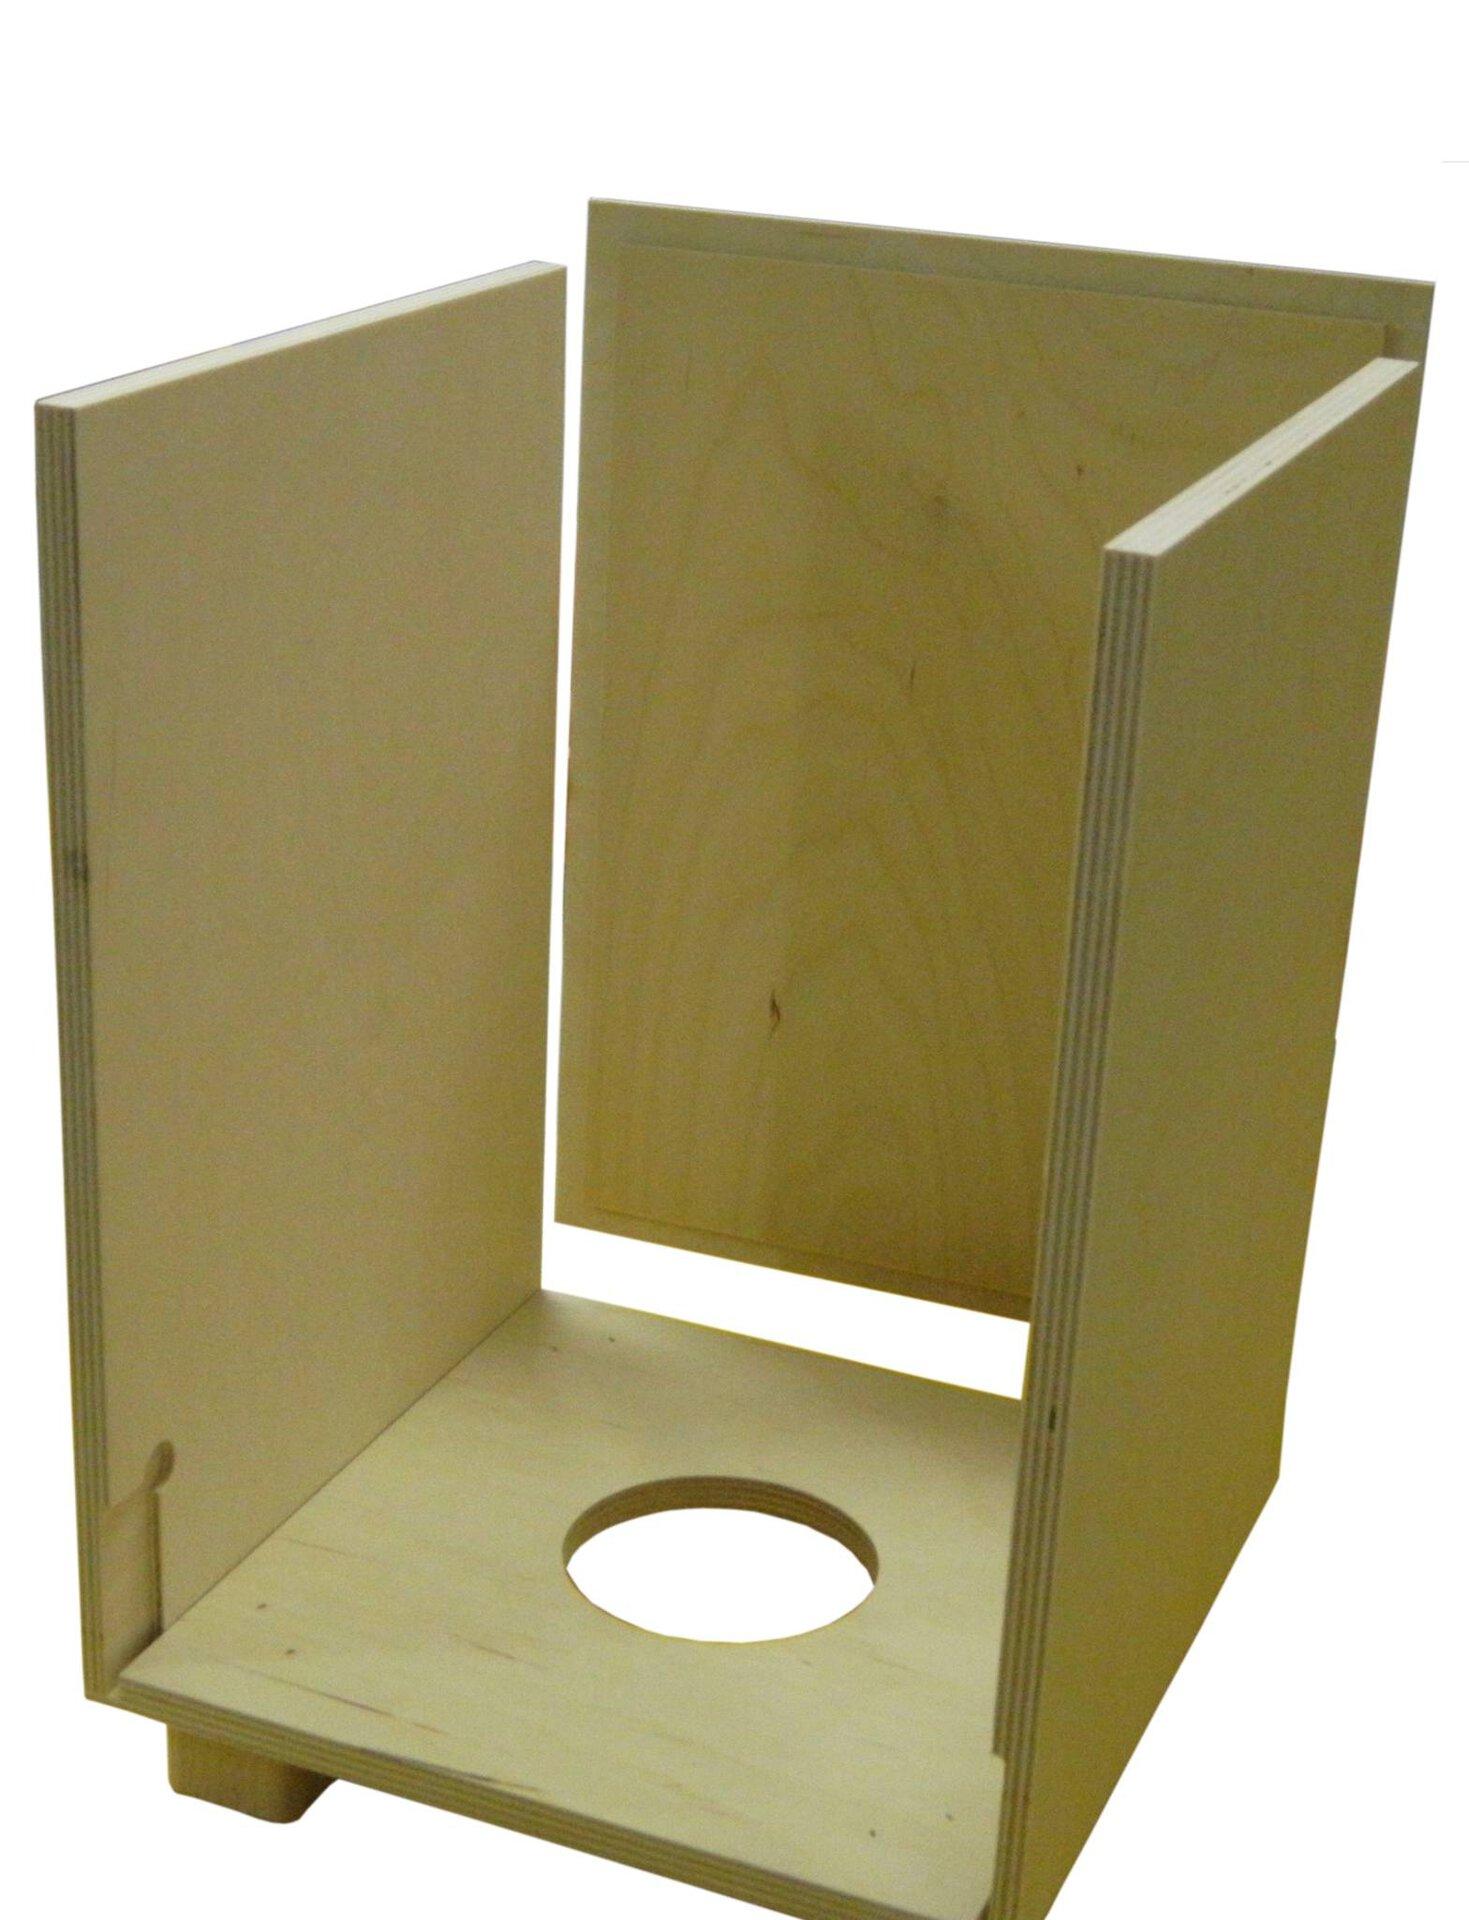 Hocker Loungehocker Baff Holz braun 32 x 49 x 32 cm